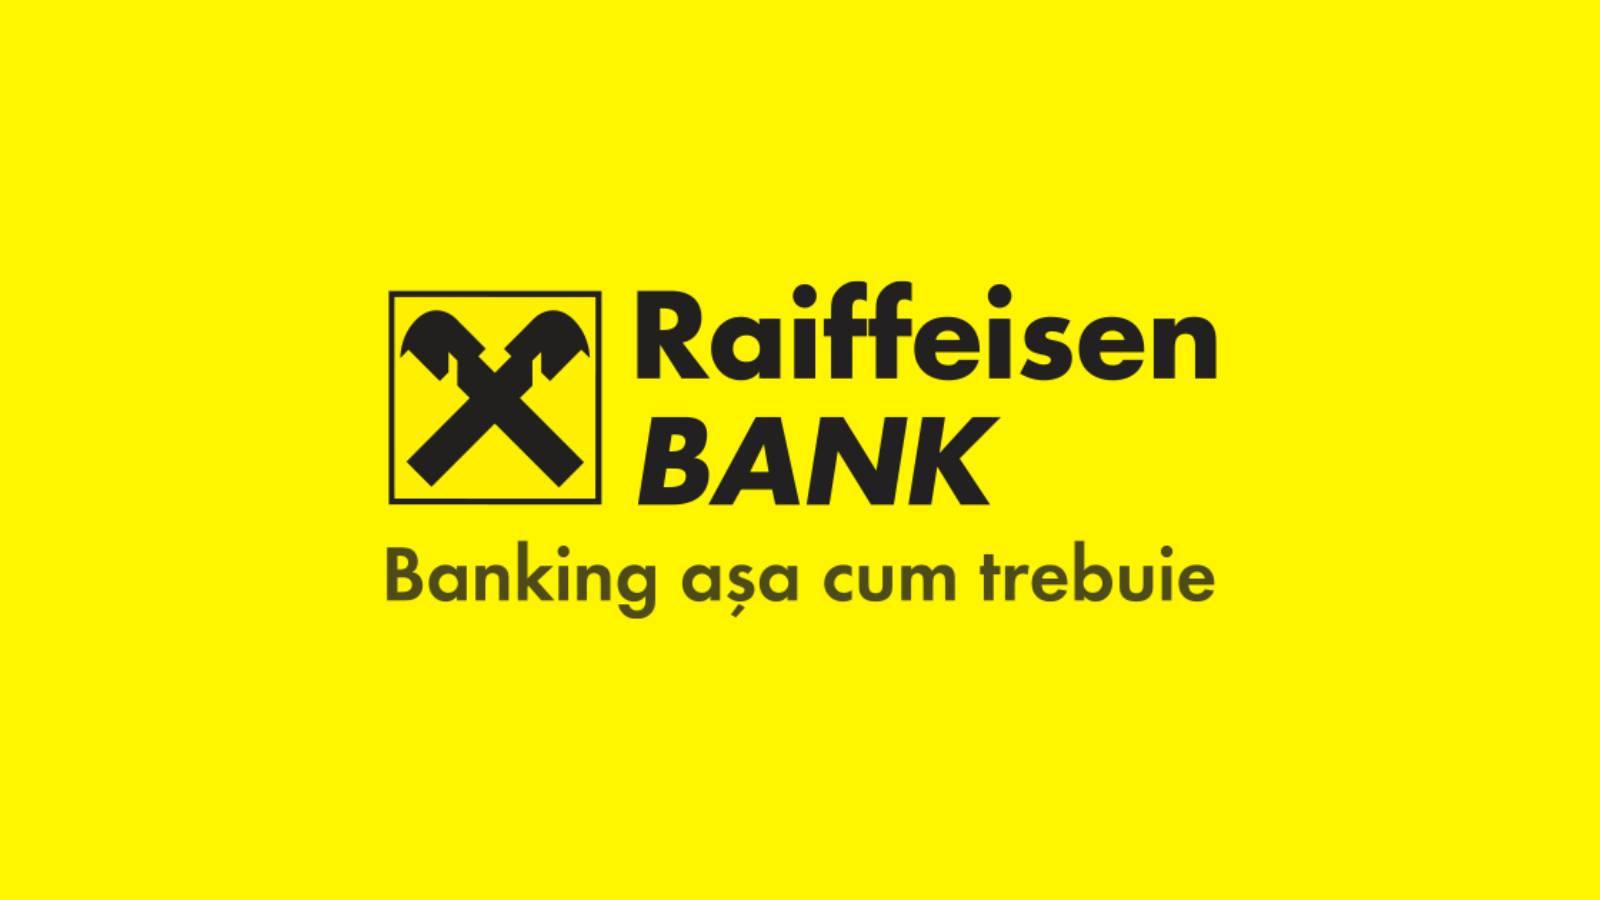 Raiffeisen Bank reemitere